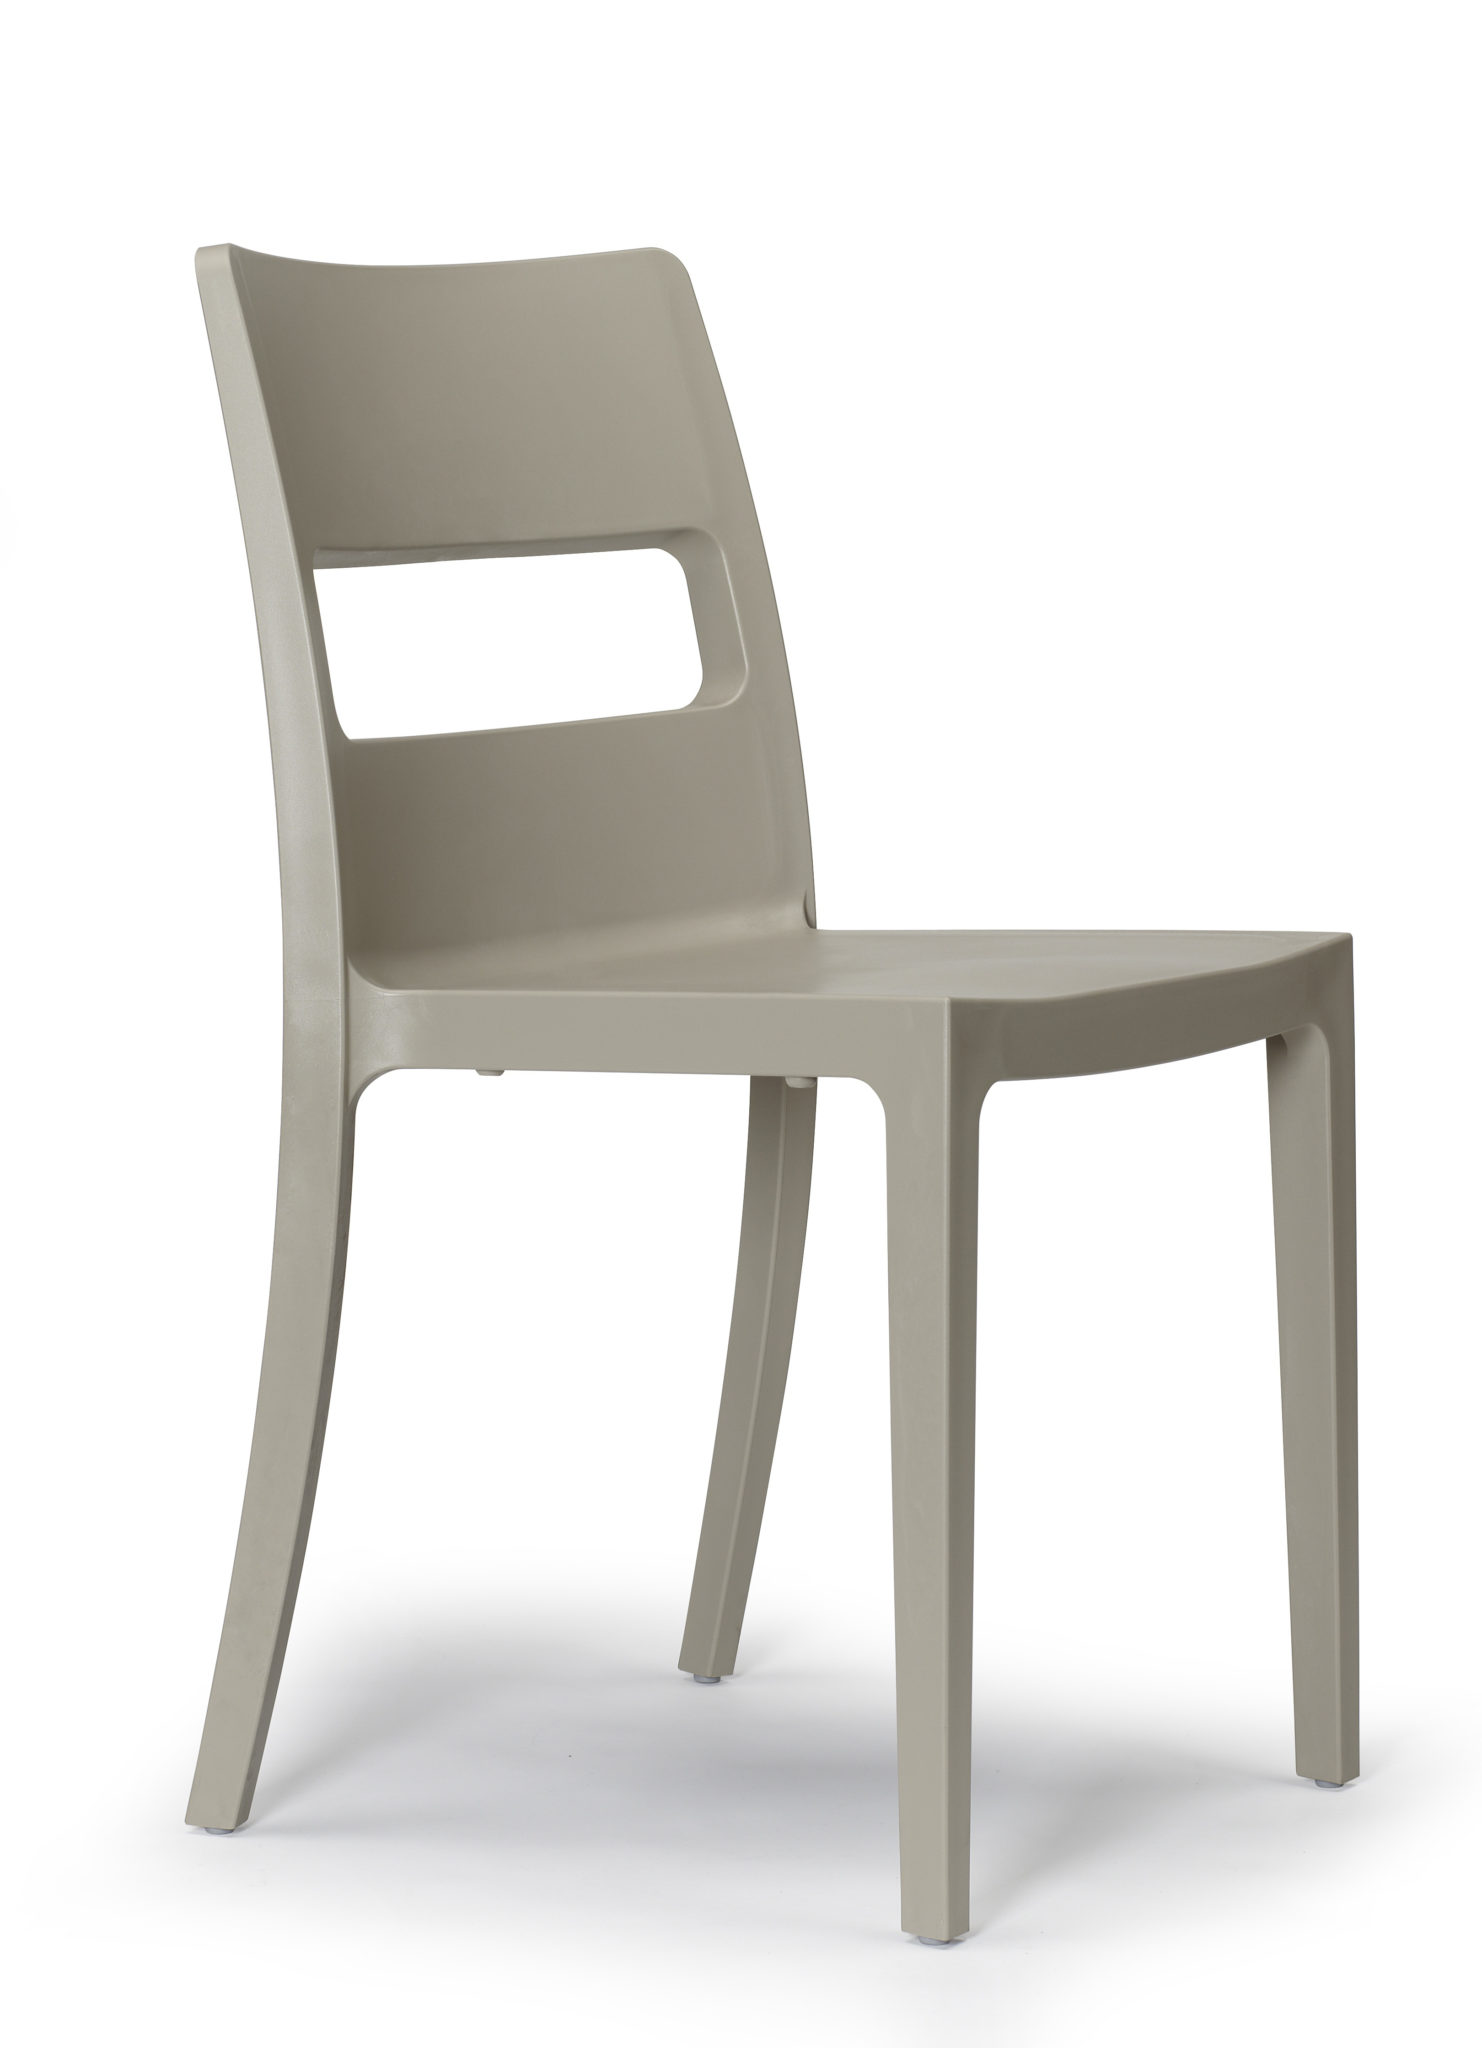 Sedia sai scab design linea tavoli e sedie for Sedie design tortora